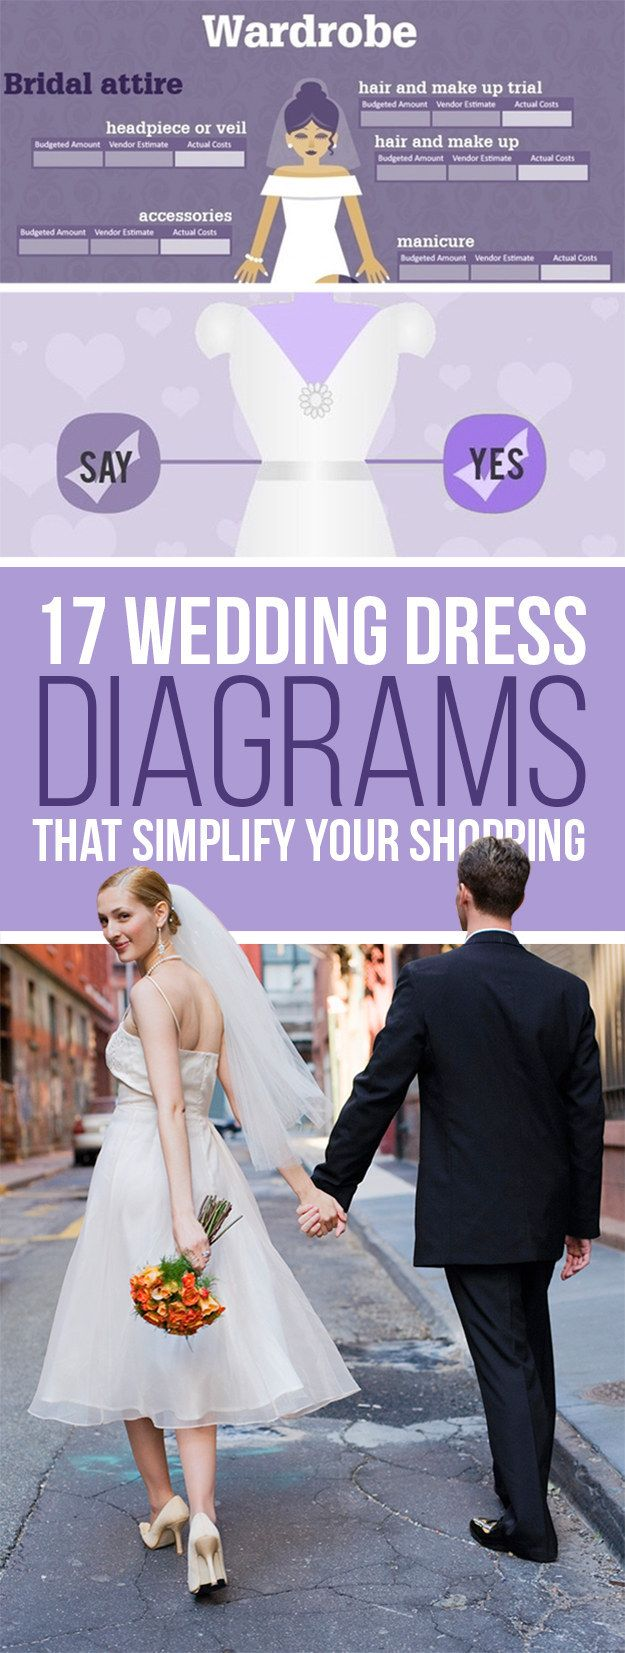 65 best Wedding: Dress images on Pinterest   Bridal dresses, Short ...